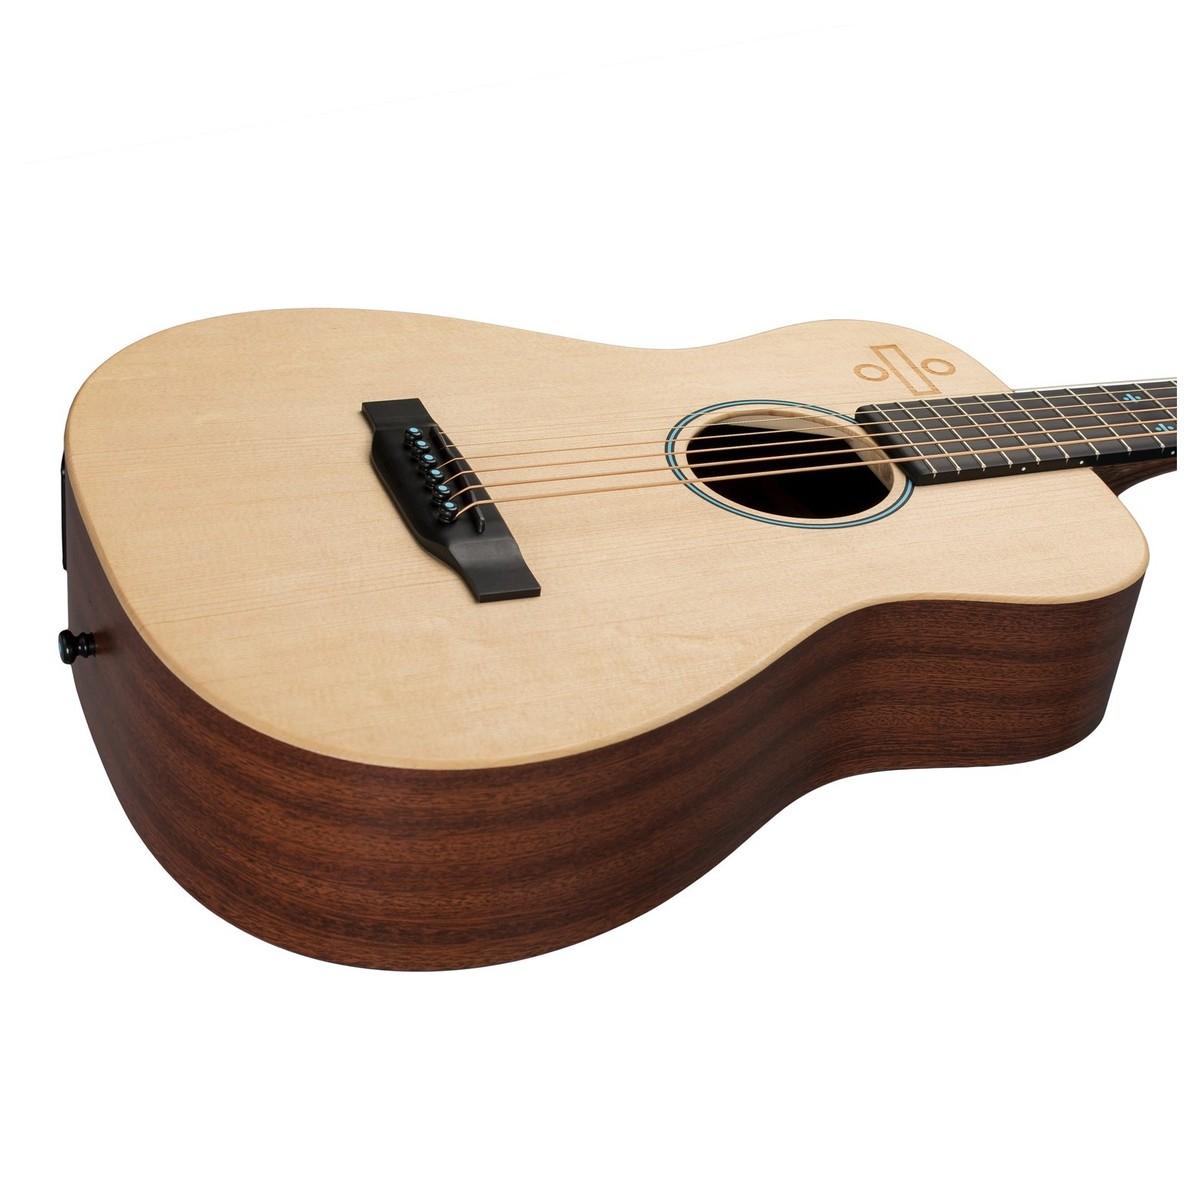 martin lx ed sheeran 39 divide 39 signature left handed guitar box opened at gear4music. Black Bedroom Furniture Sets. Home Design Ideas